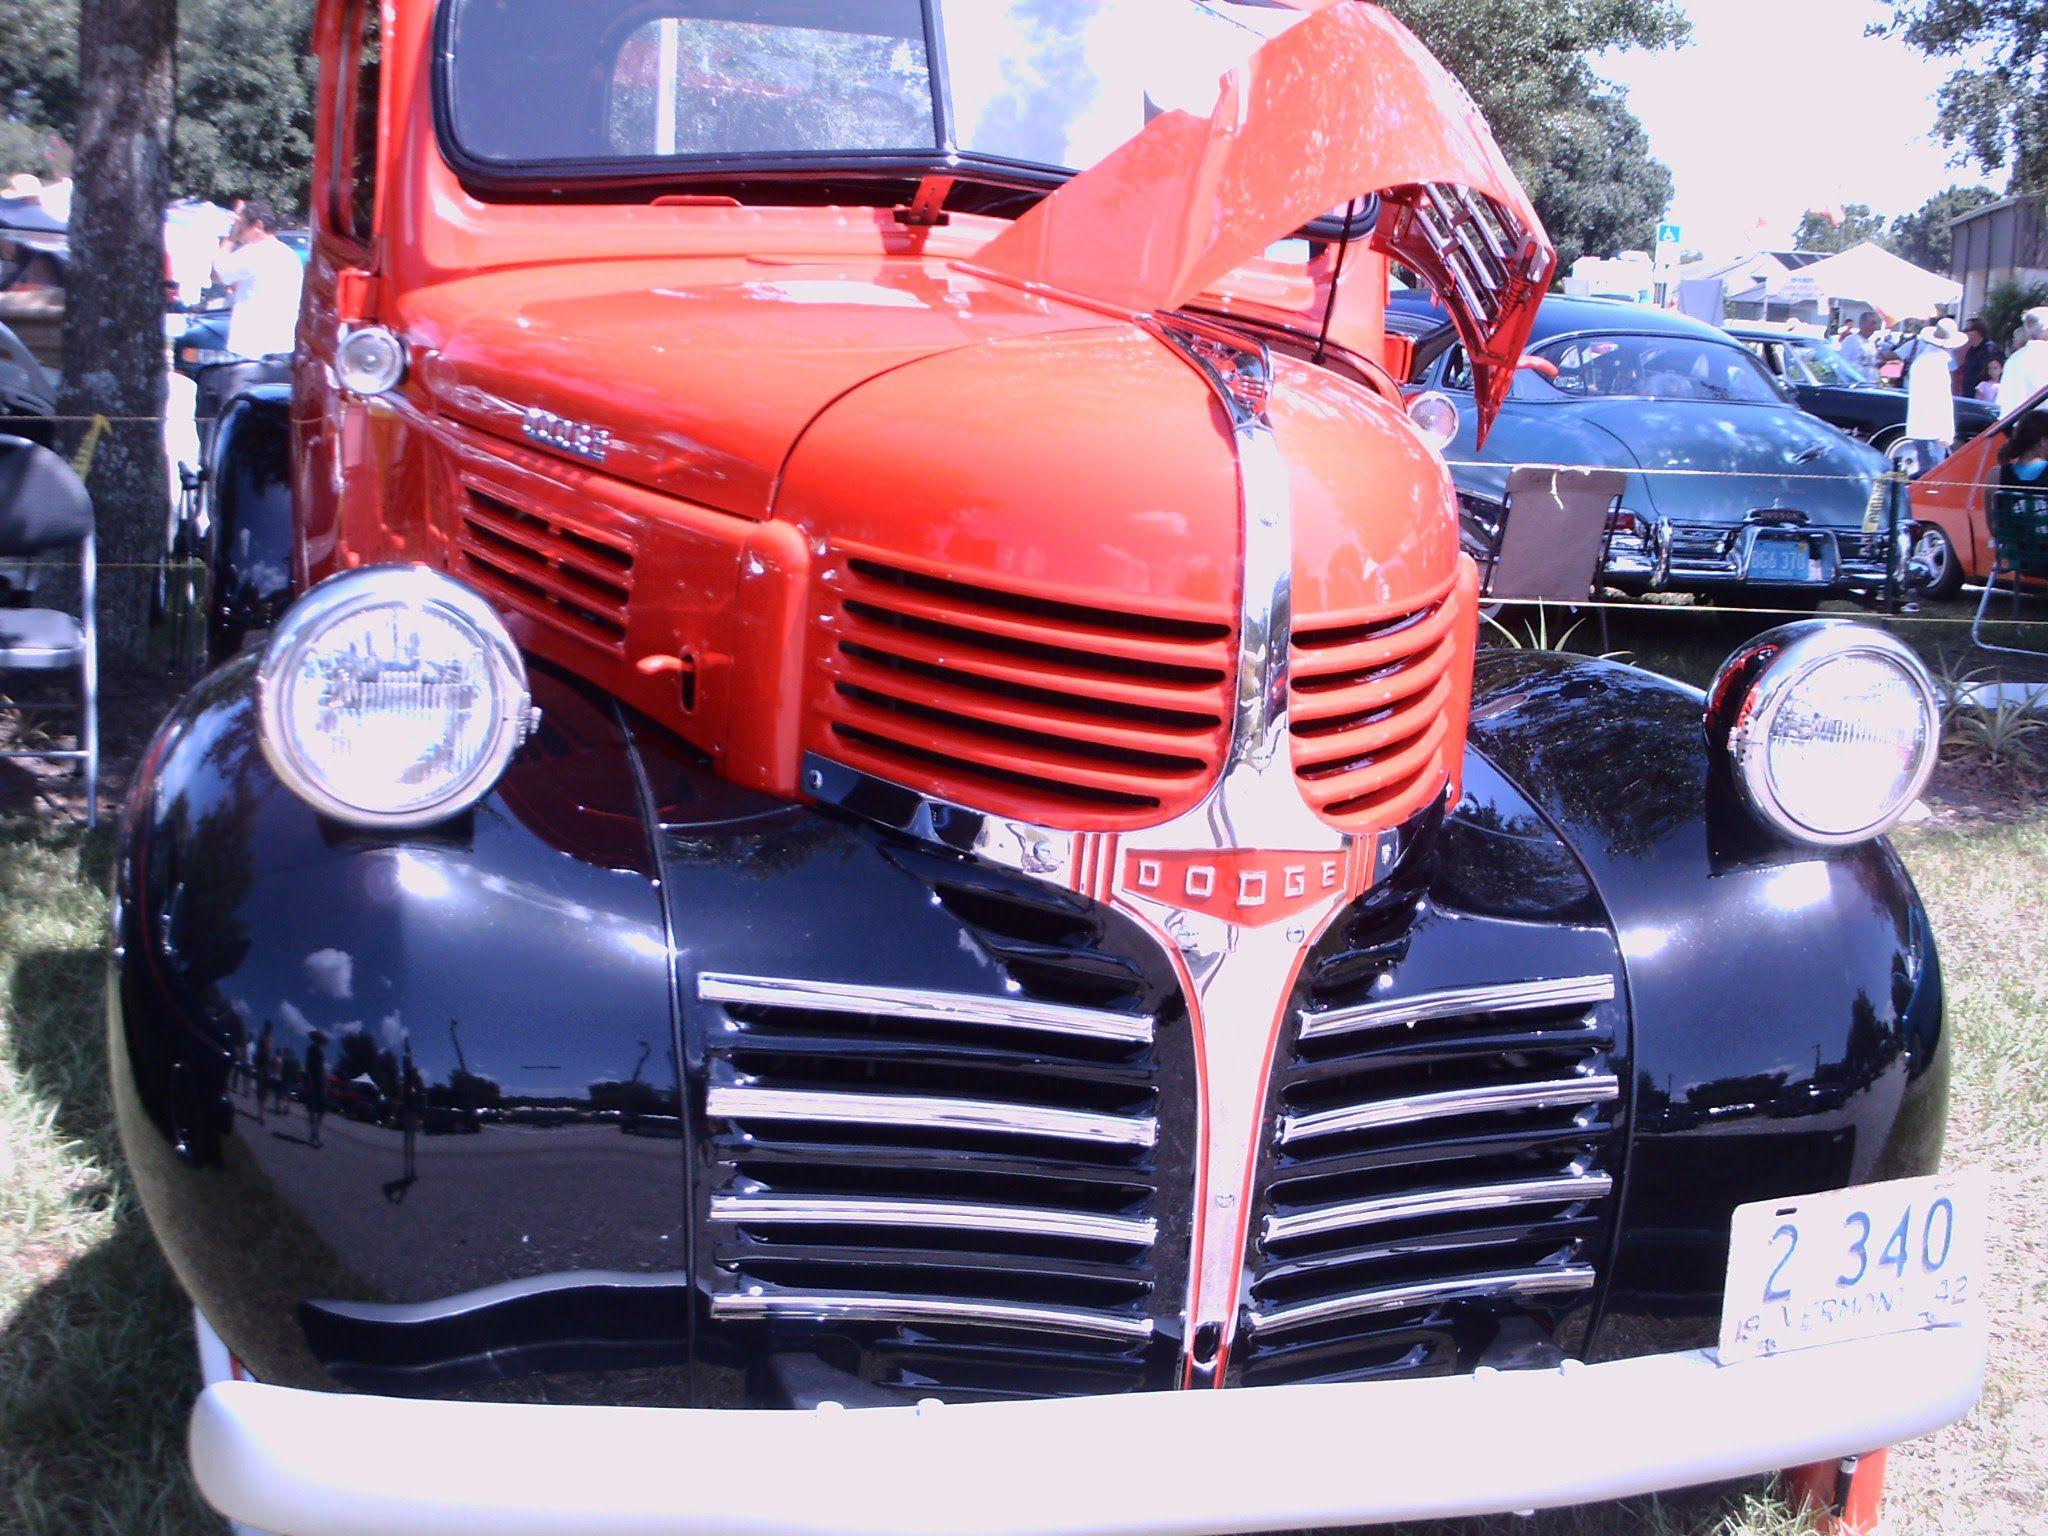 1941 Dodge Half Ton Pickup Truck Redblk Lakeland090114 Pickup Trucks Dodge Trucks